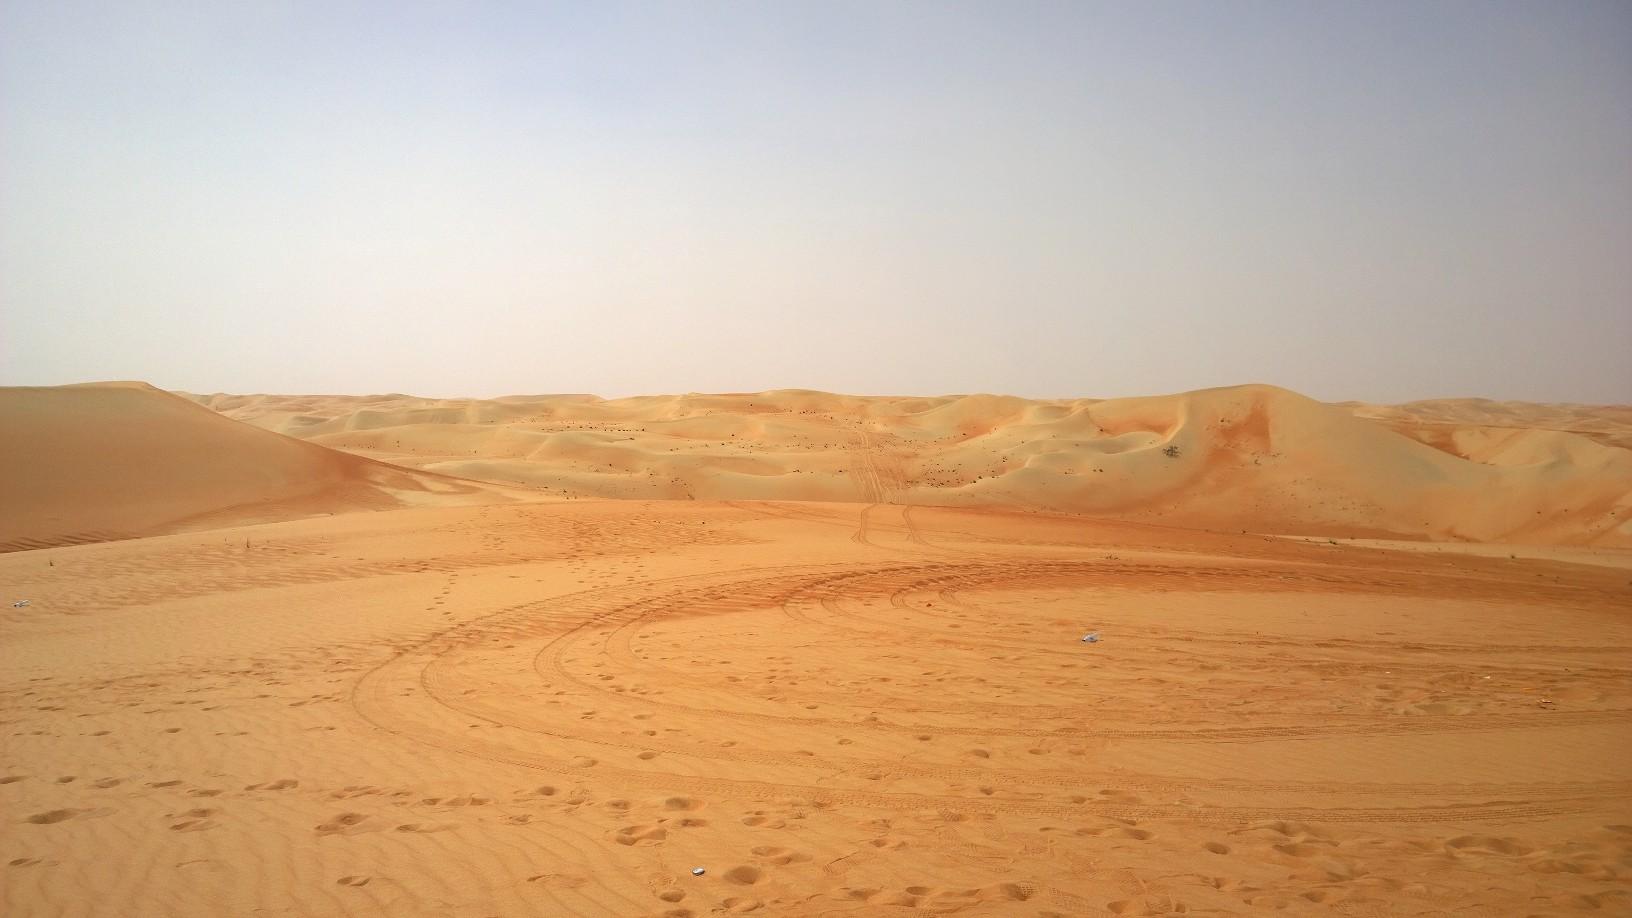 Yamaha Rally Dakar 2016 desert dunes challenge